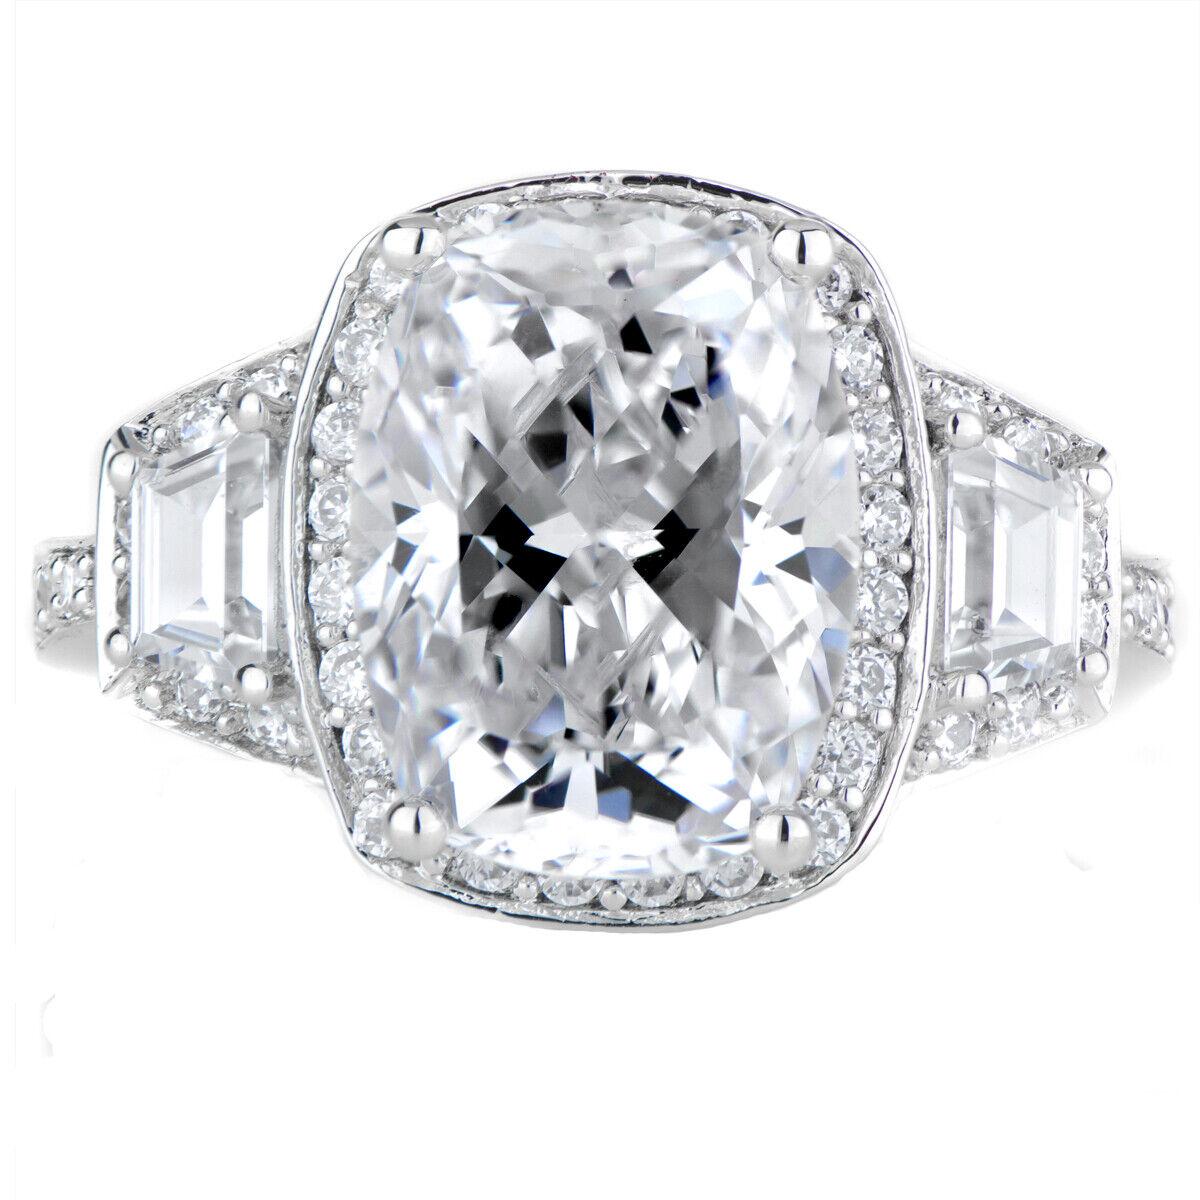 GIA Certified Diamond Engagement Ring Natural Cushion Cut 4.22 carat Platinum